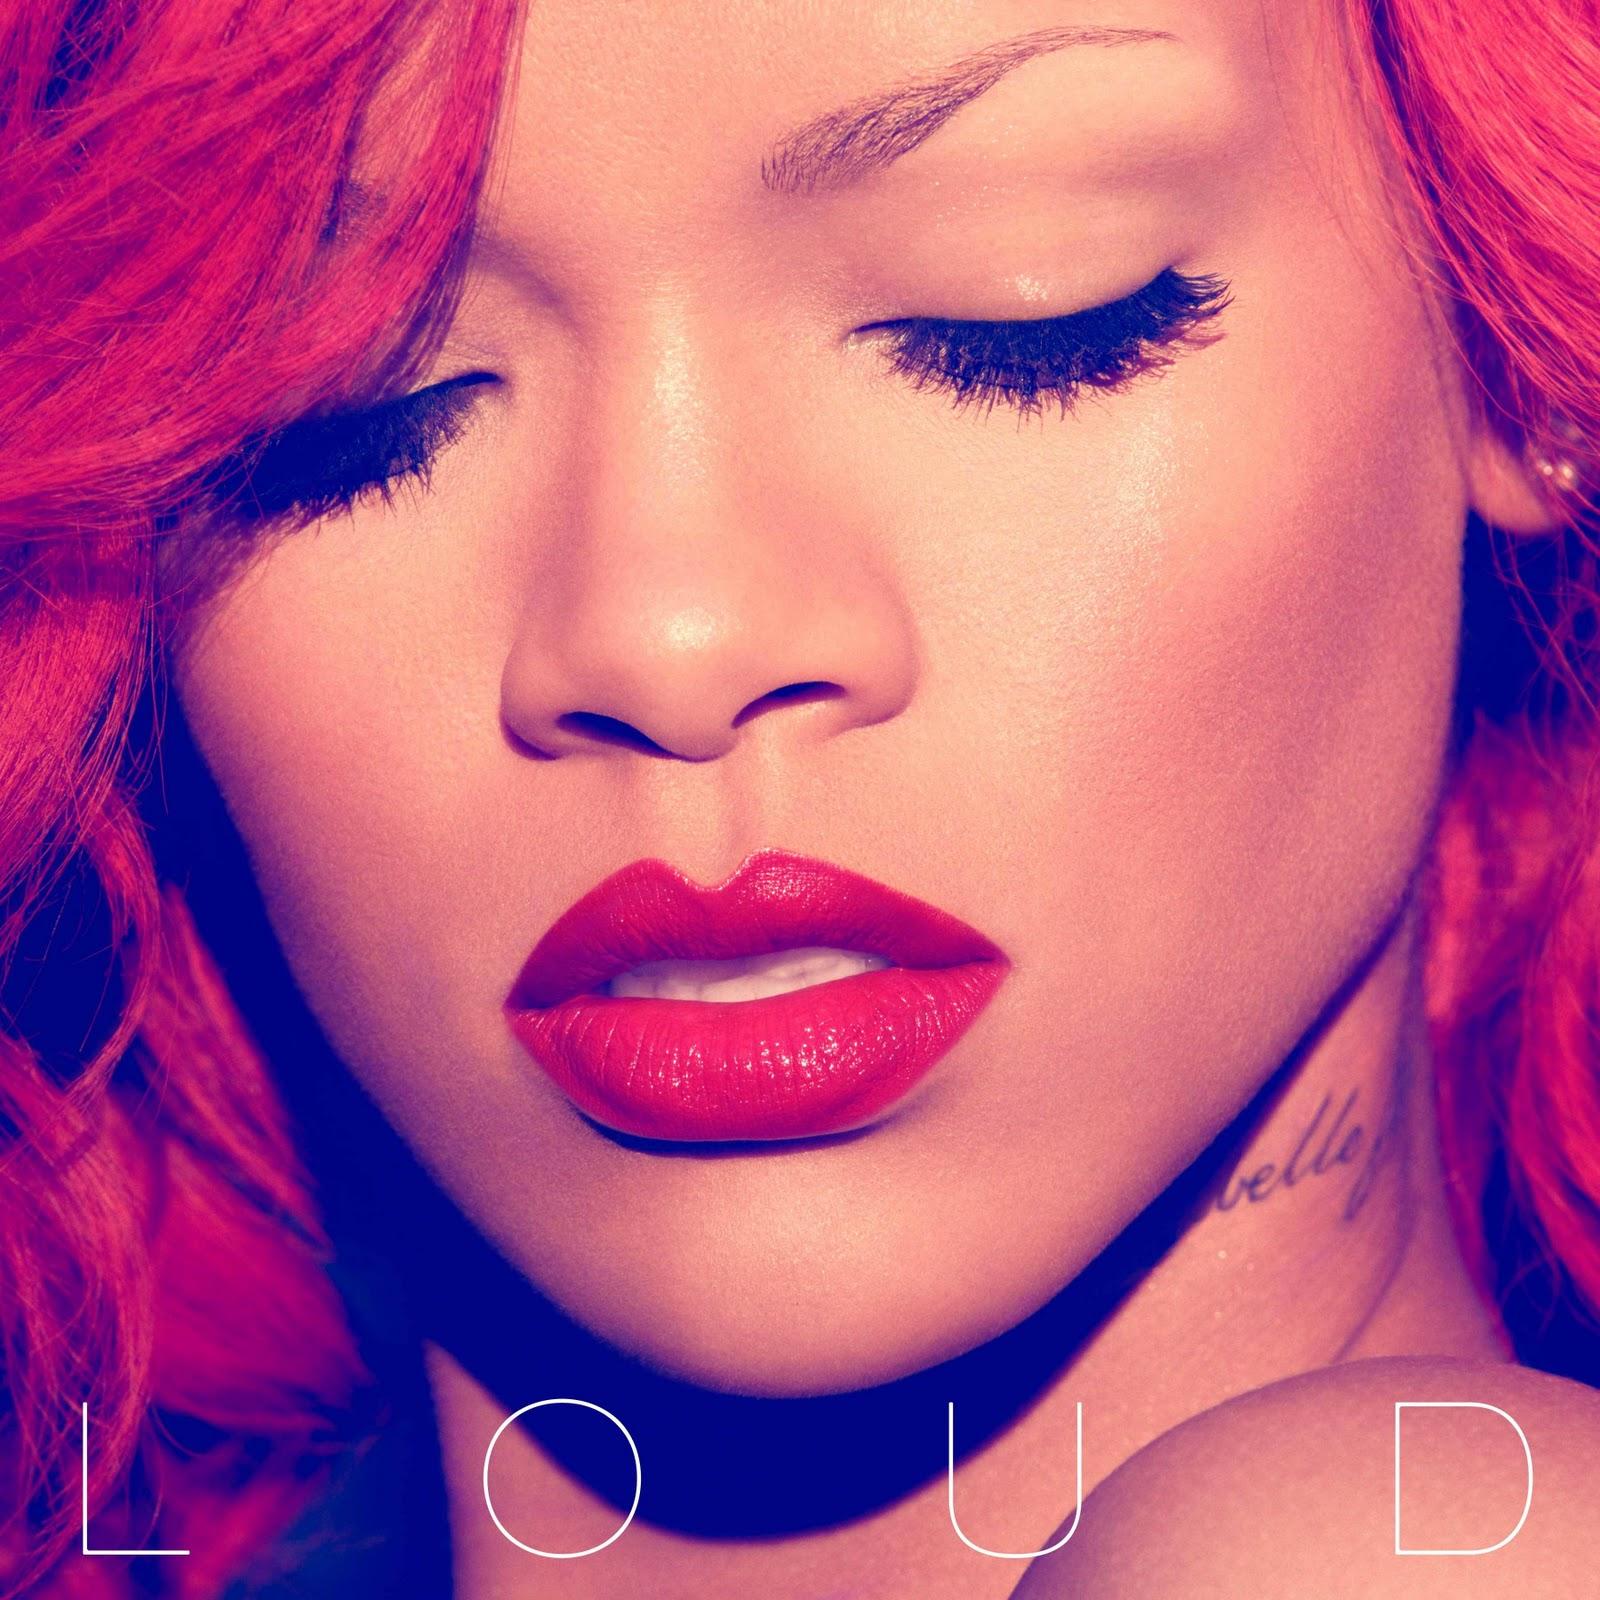 http://3.bp.blogspot.com/_lgTyldTrebU/TVMhrknu2gI/AAAAAAAAANw/WjB32LzA8e8/s1600/Rihanna-Loud-Album-Cover.jpg